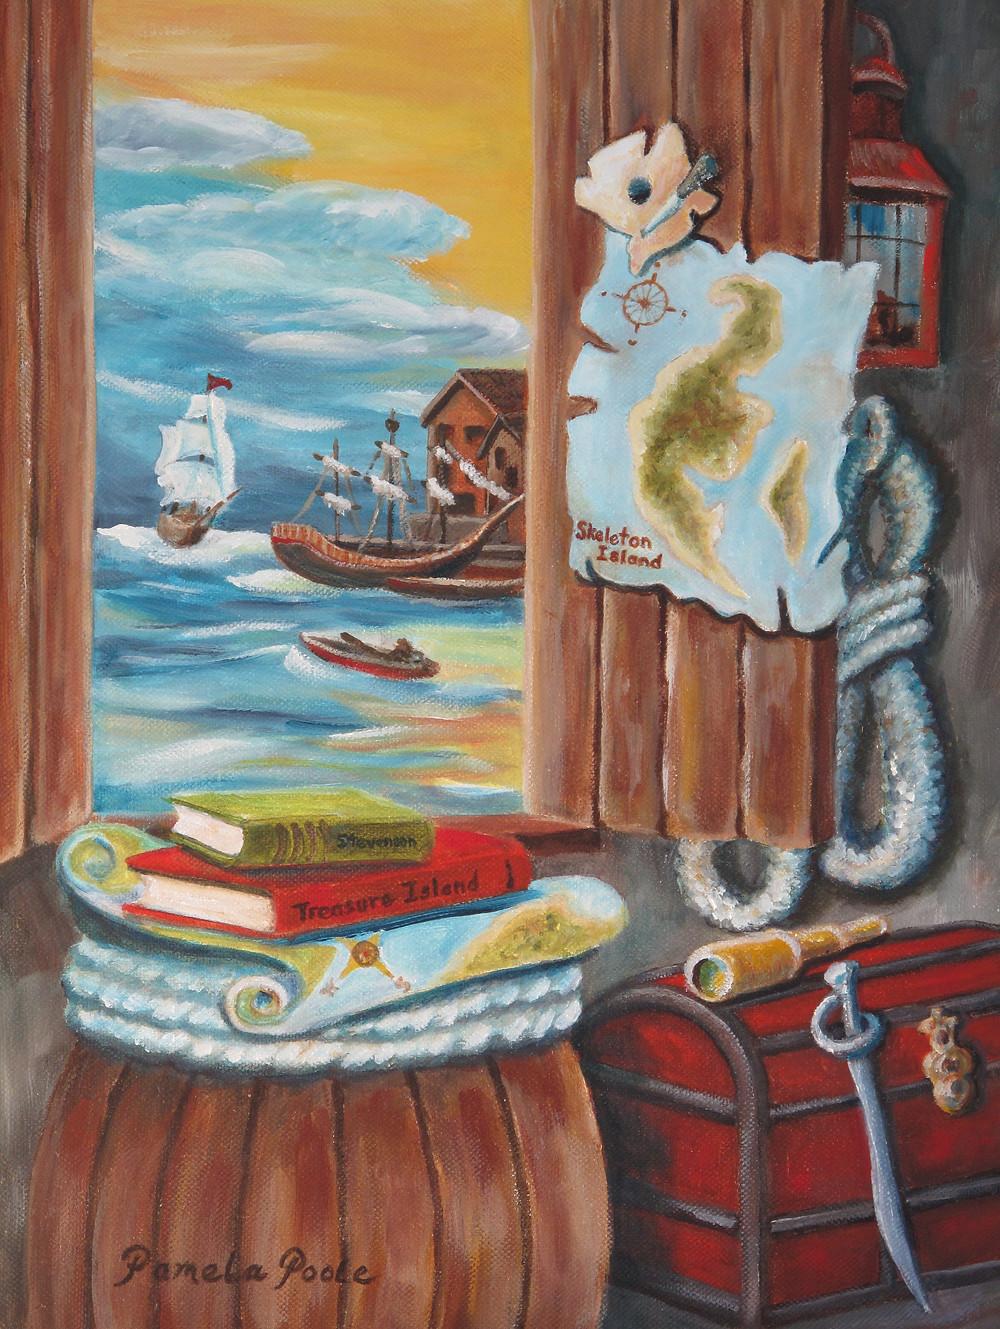 """Hunt for Treasure Island"" by Pamela Poole"